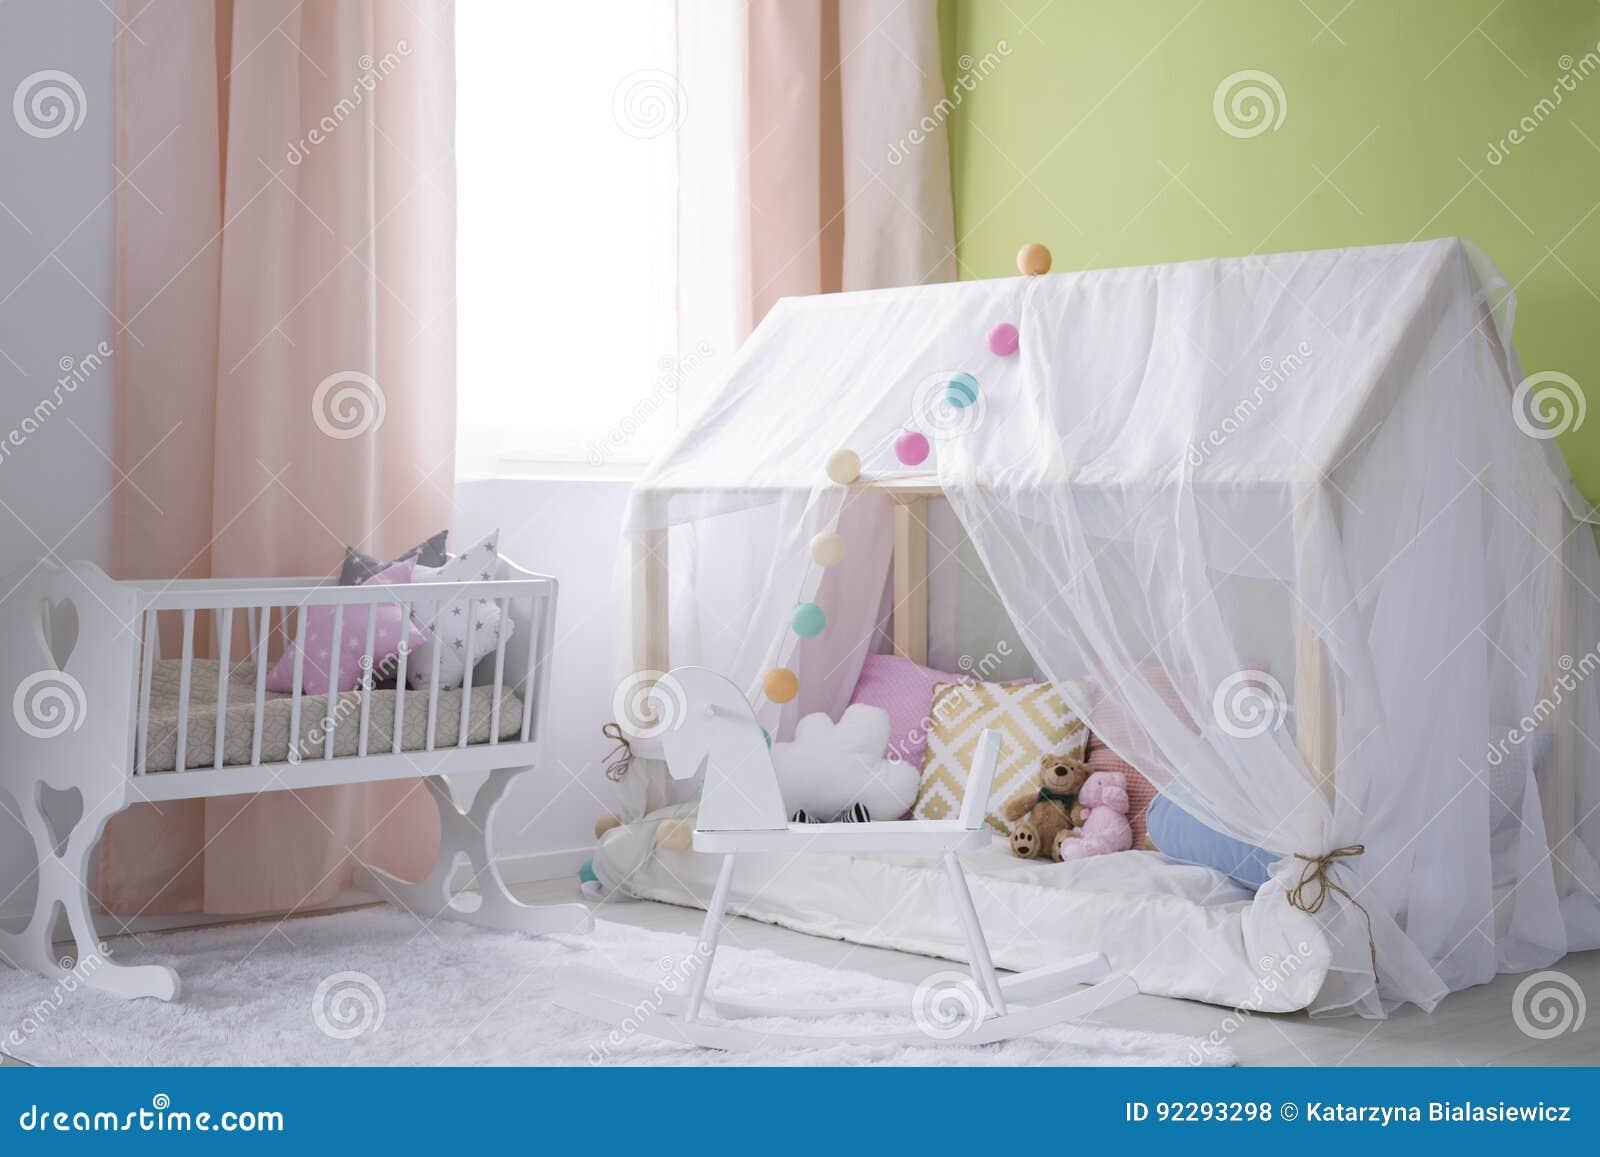 Меньший дом для младенца